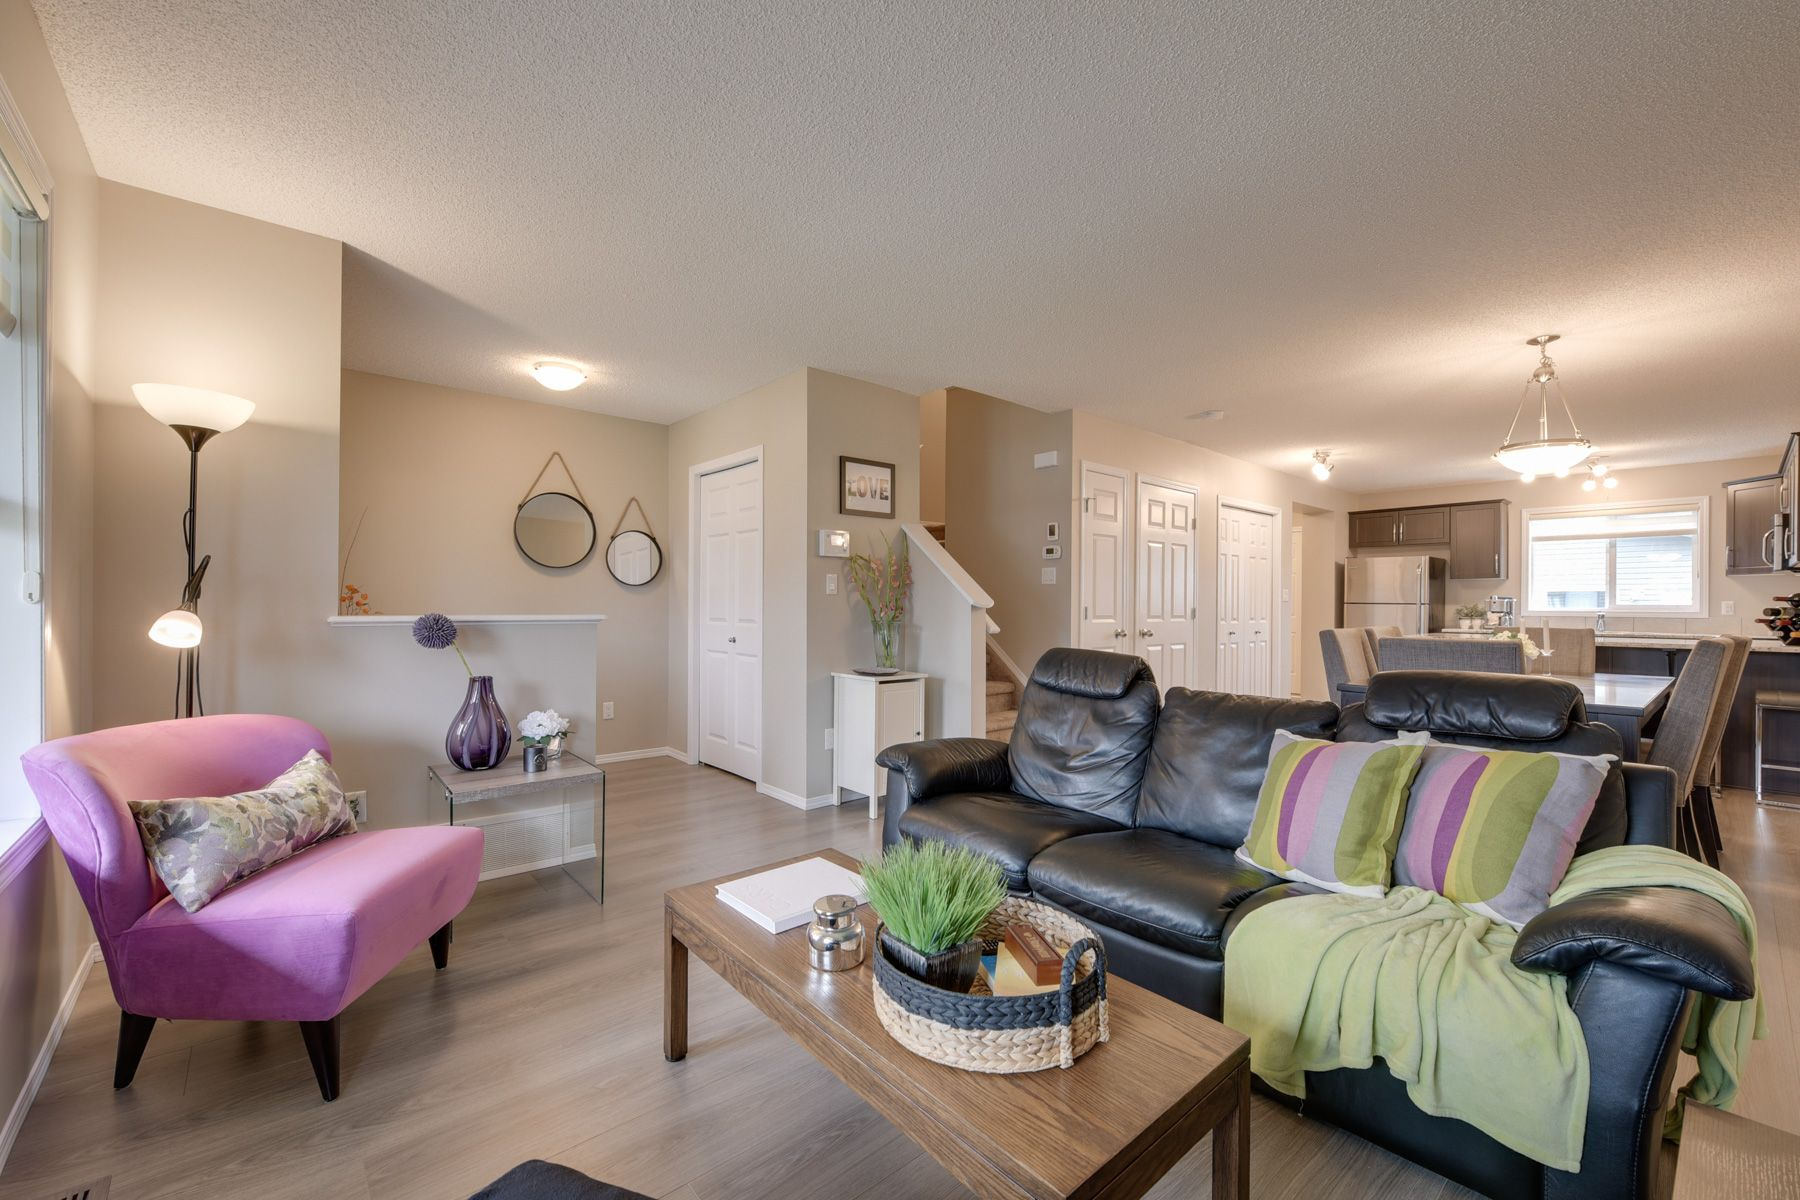 Main Photo: 732 Secord Boulevard: Edmonton House for sale : MLS®# E4128935